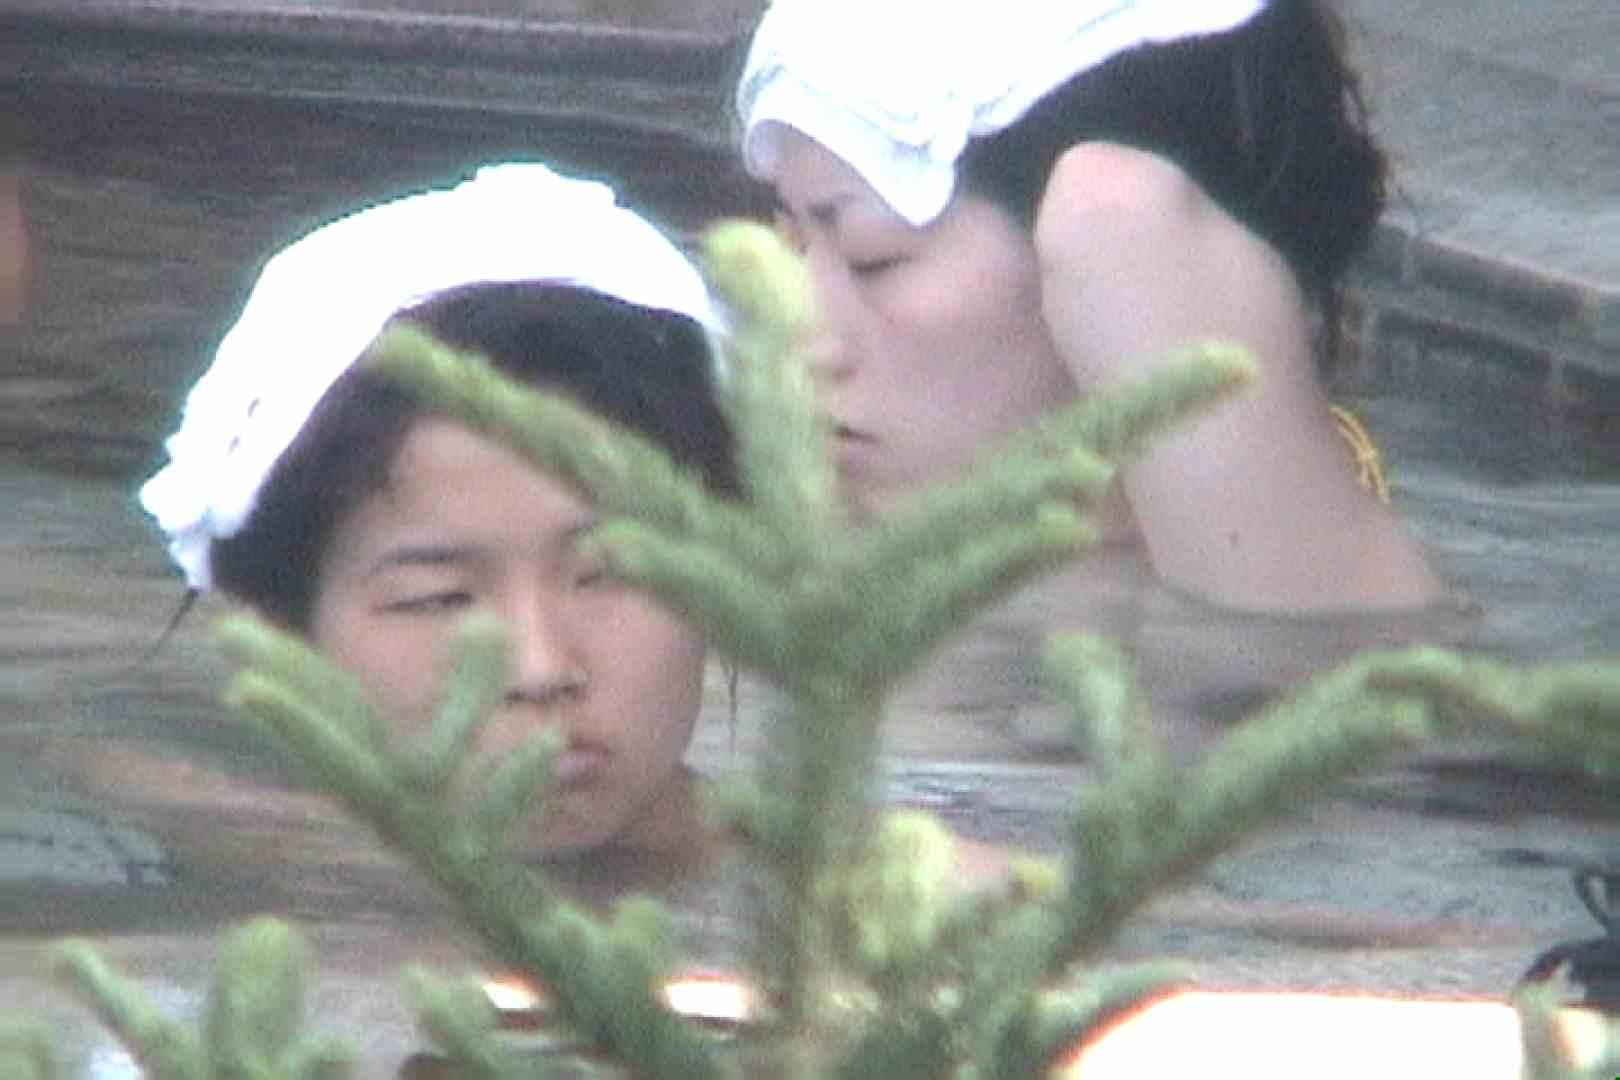 Aquaな露天風呂Vol.80【VIP限定】 盗撮大放出 濡れ場動画紹介 73連発 3